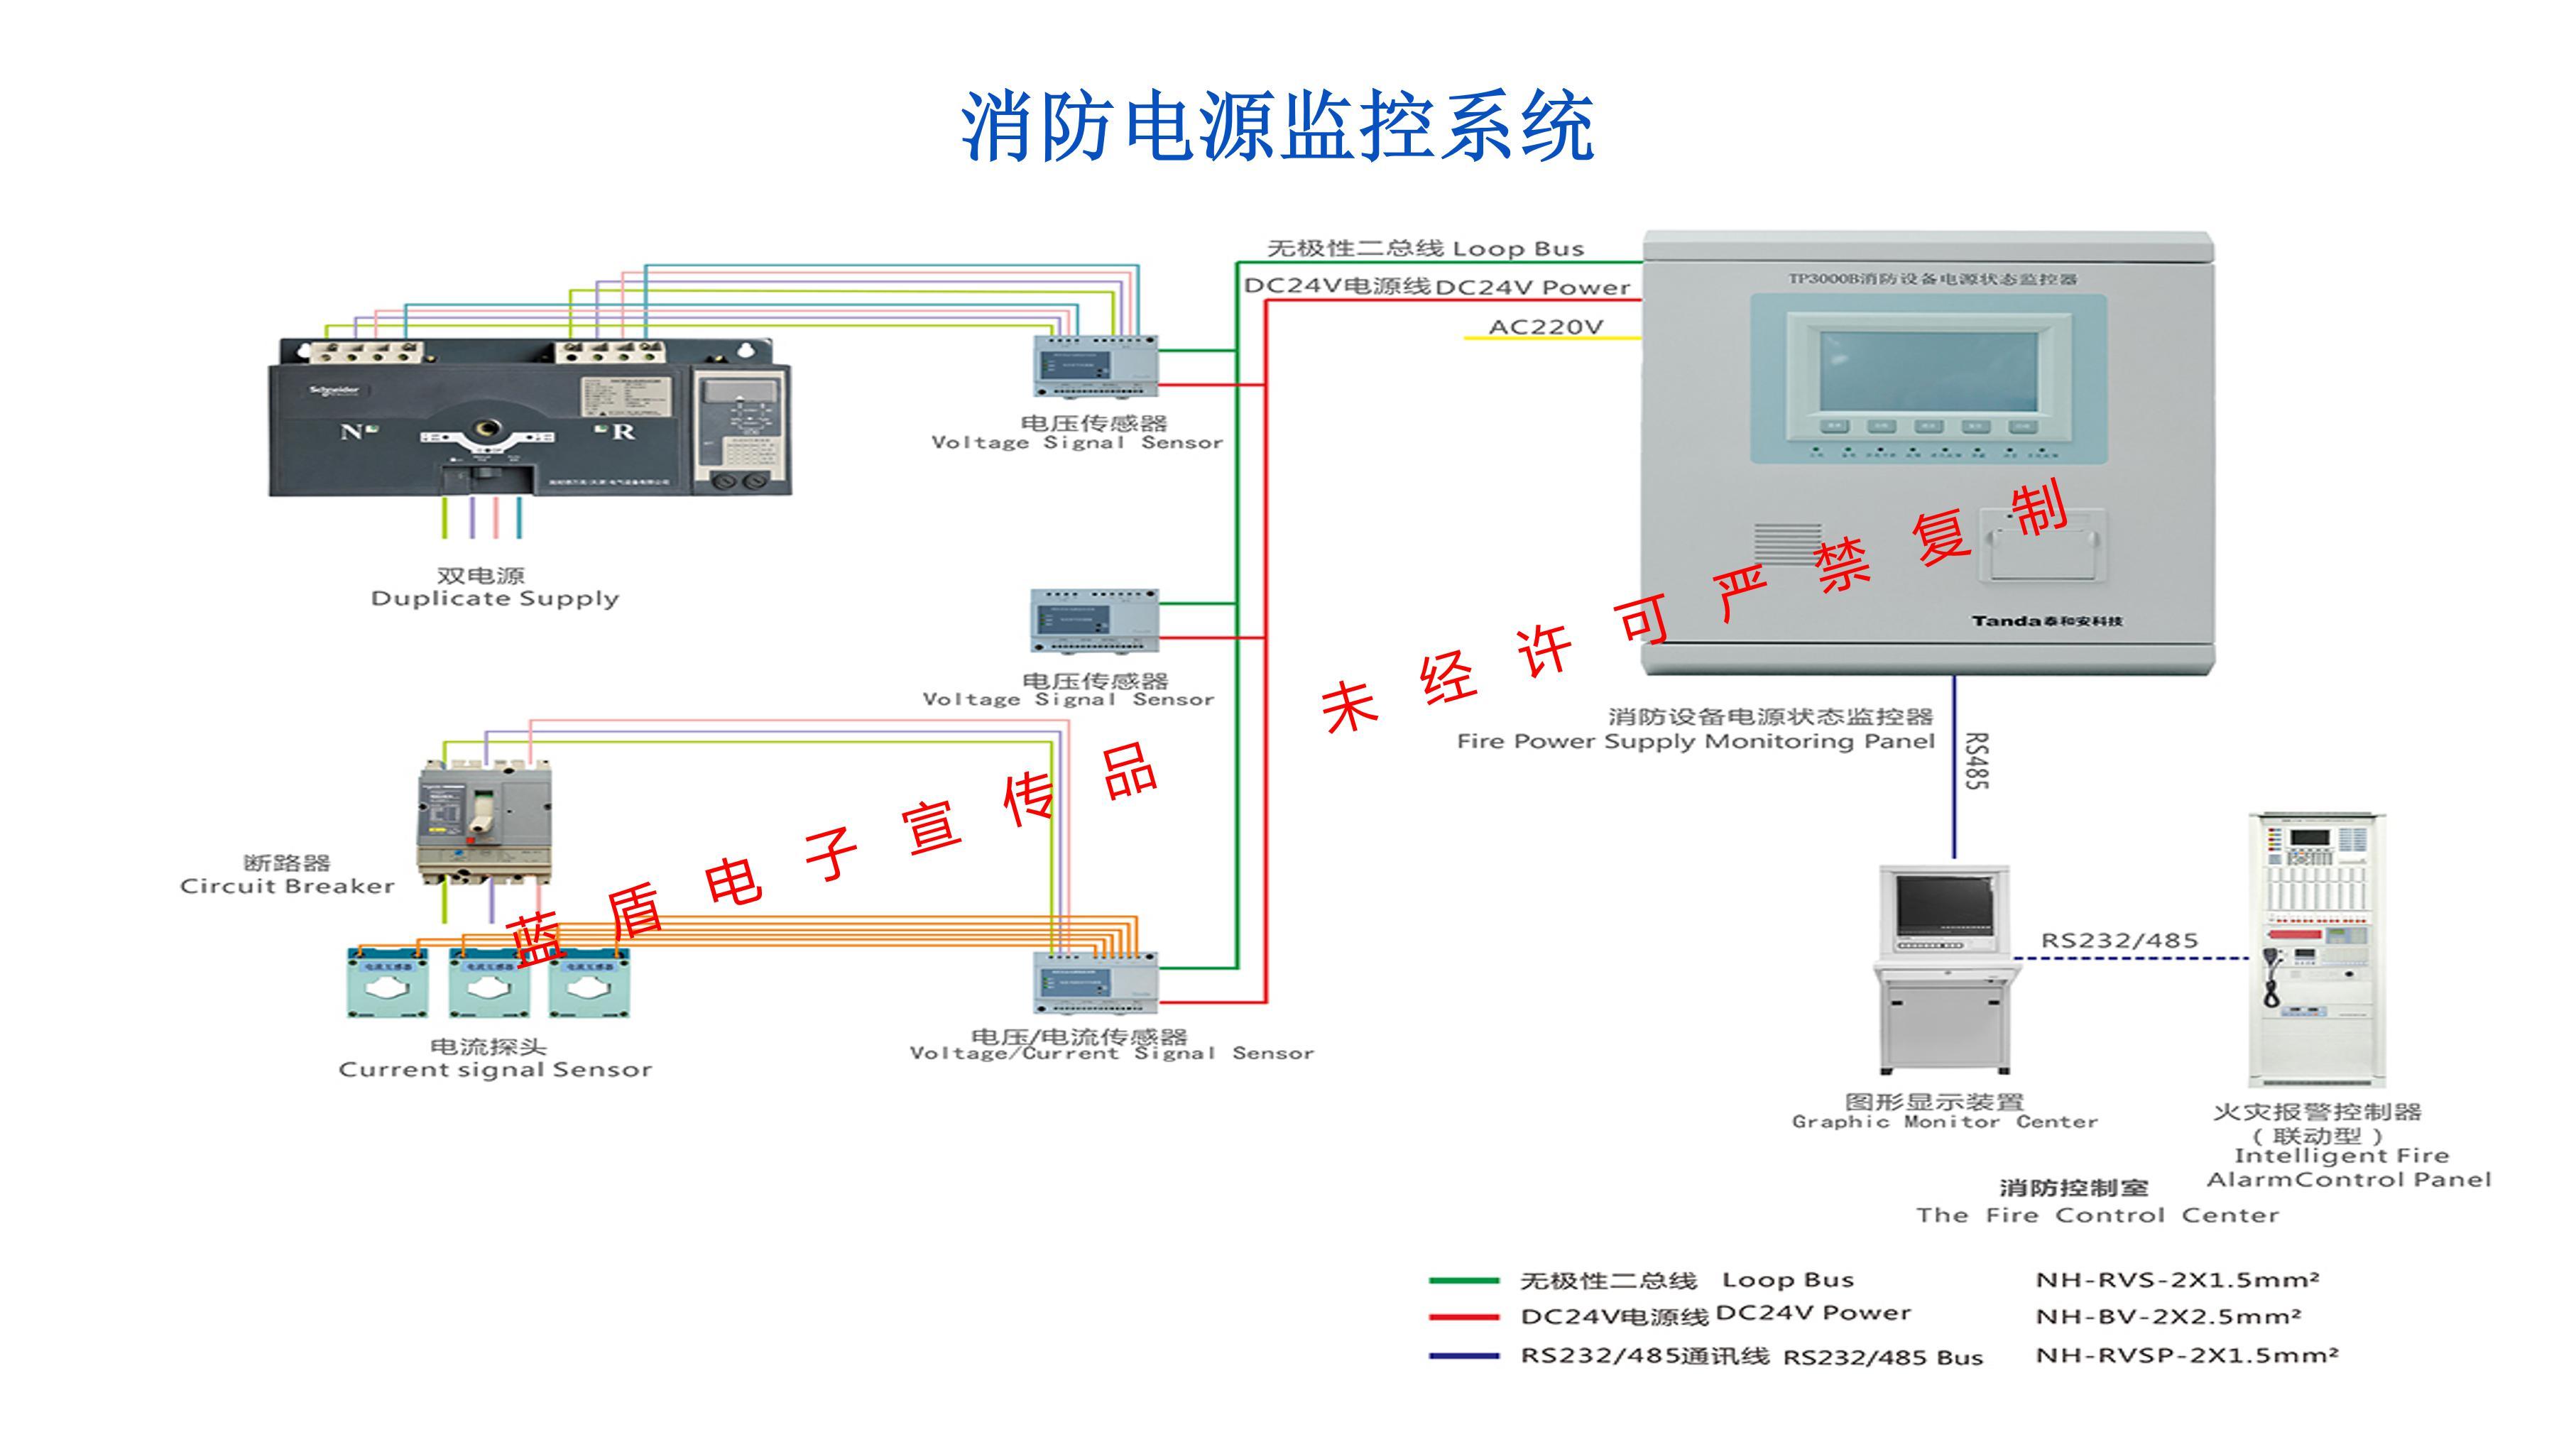 betway体育官网下载设施工程文案_07.jpg